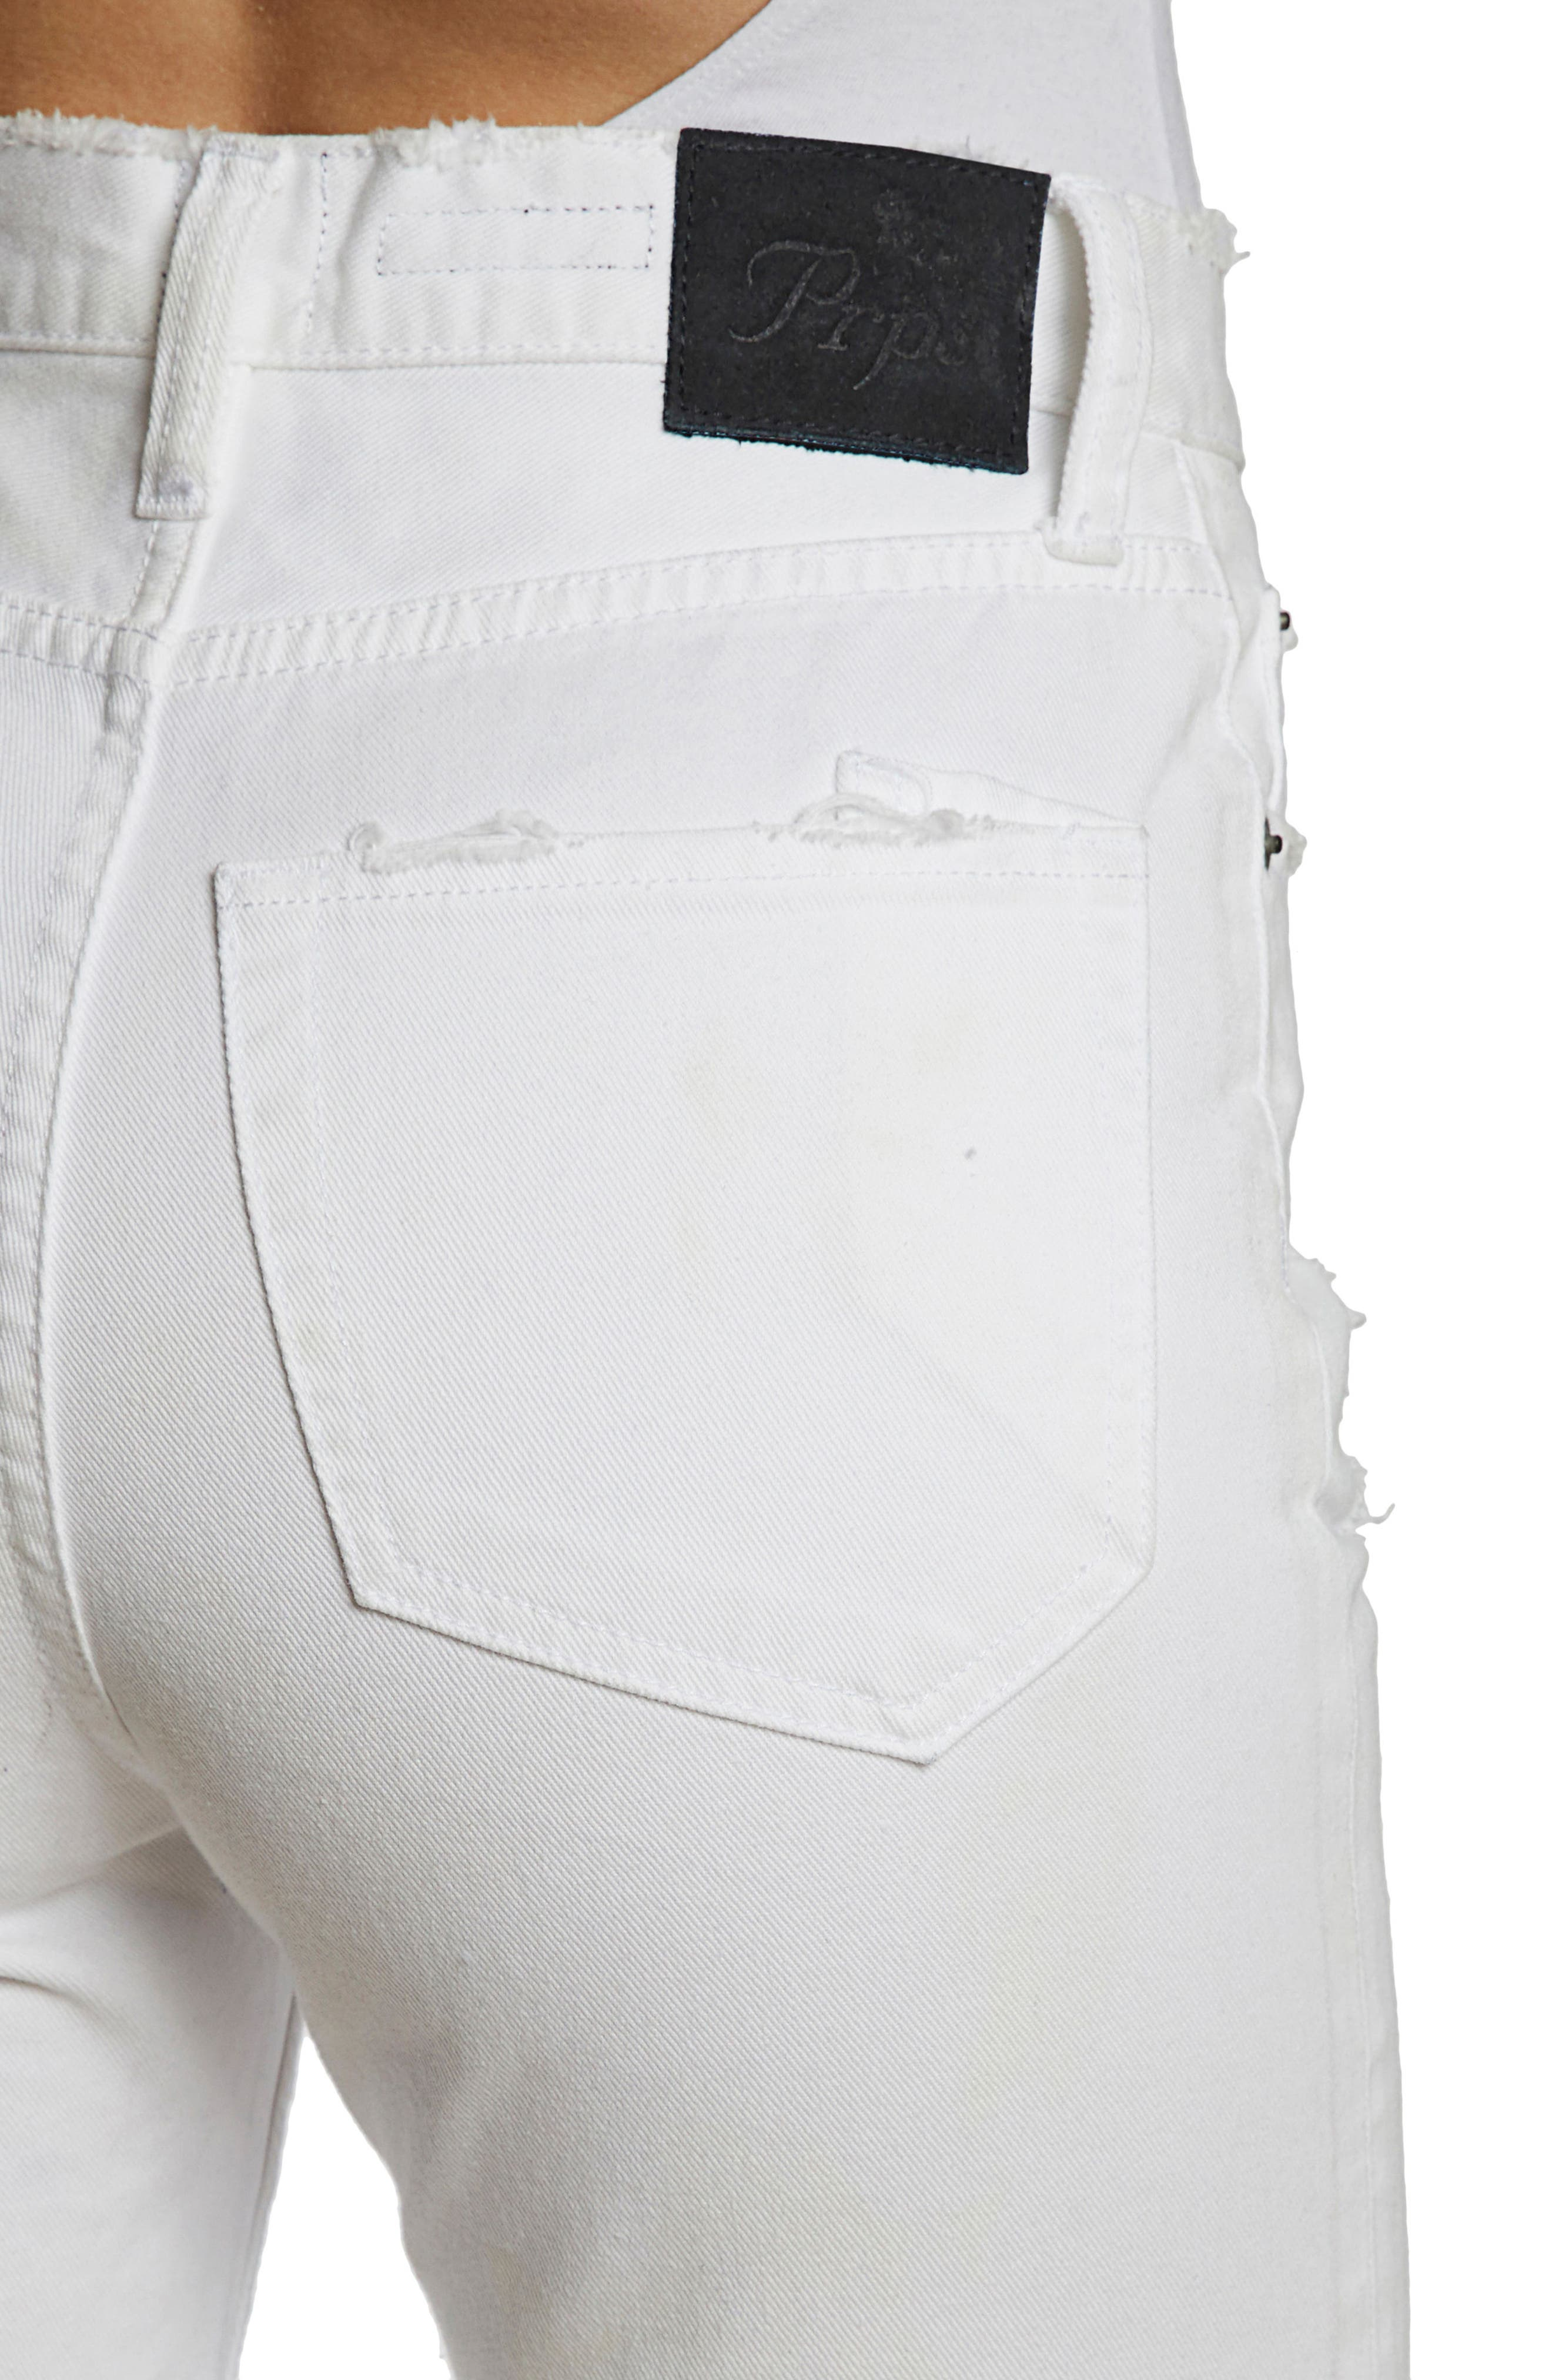 AMX Distressed High Waist Released Hem Ankle Jeans,                             Alternate thumbnail 4, color,                             100